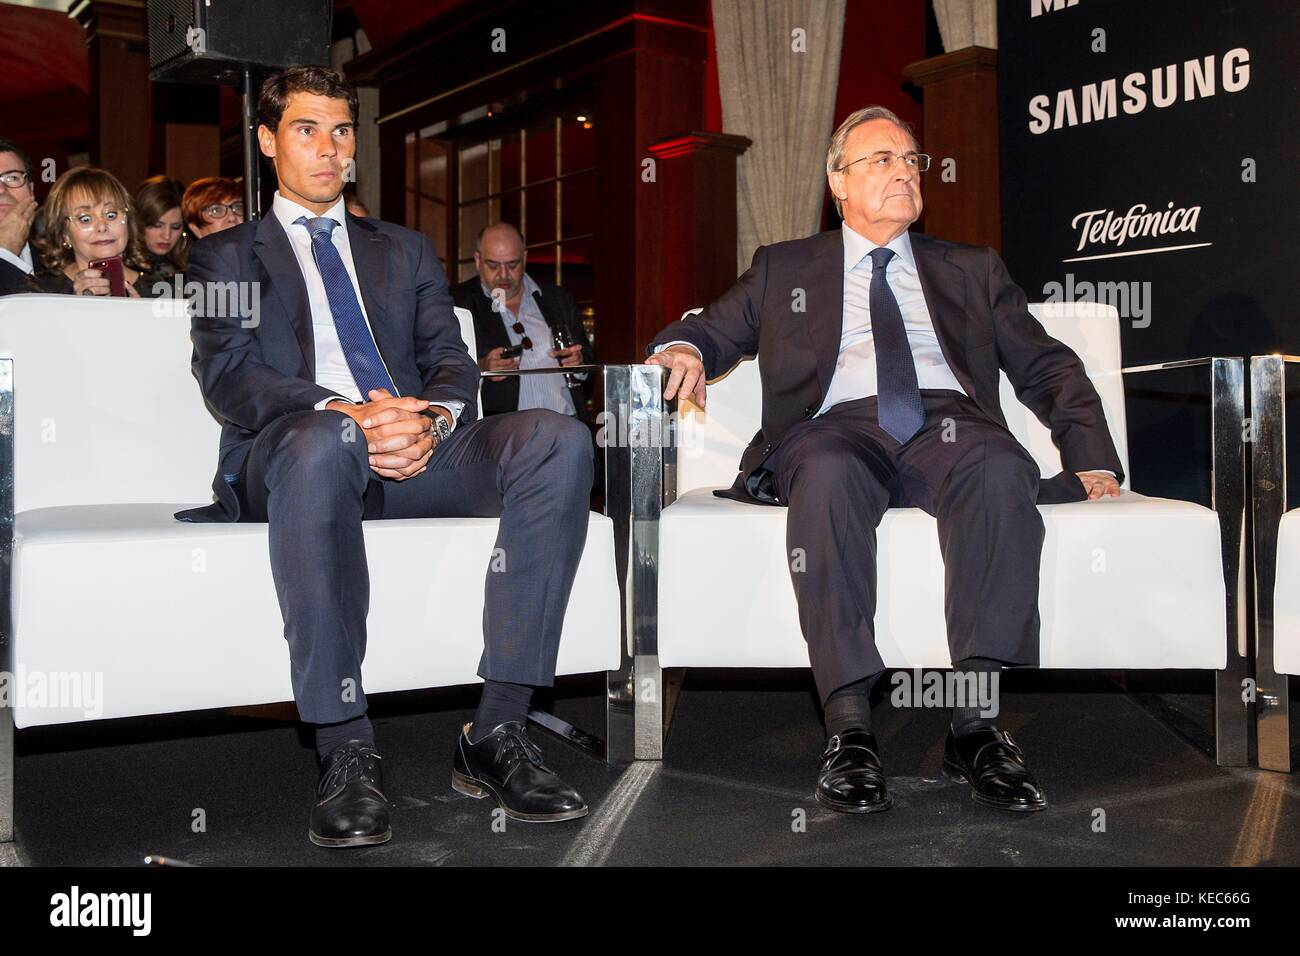 Madrid, Spain. 20th Oct, 2017. Spanish tennis player Rafael Nadaland Real Madrid´s president Florentino Perez - Stock Image